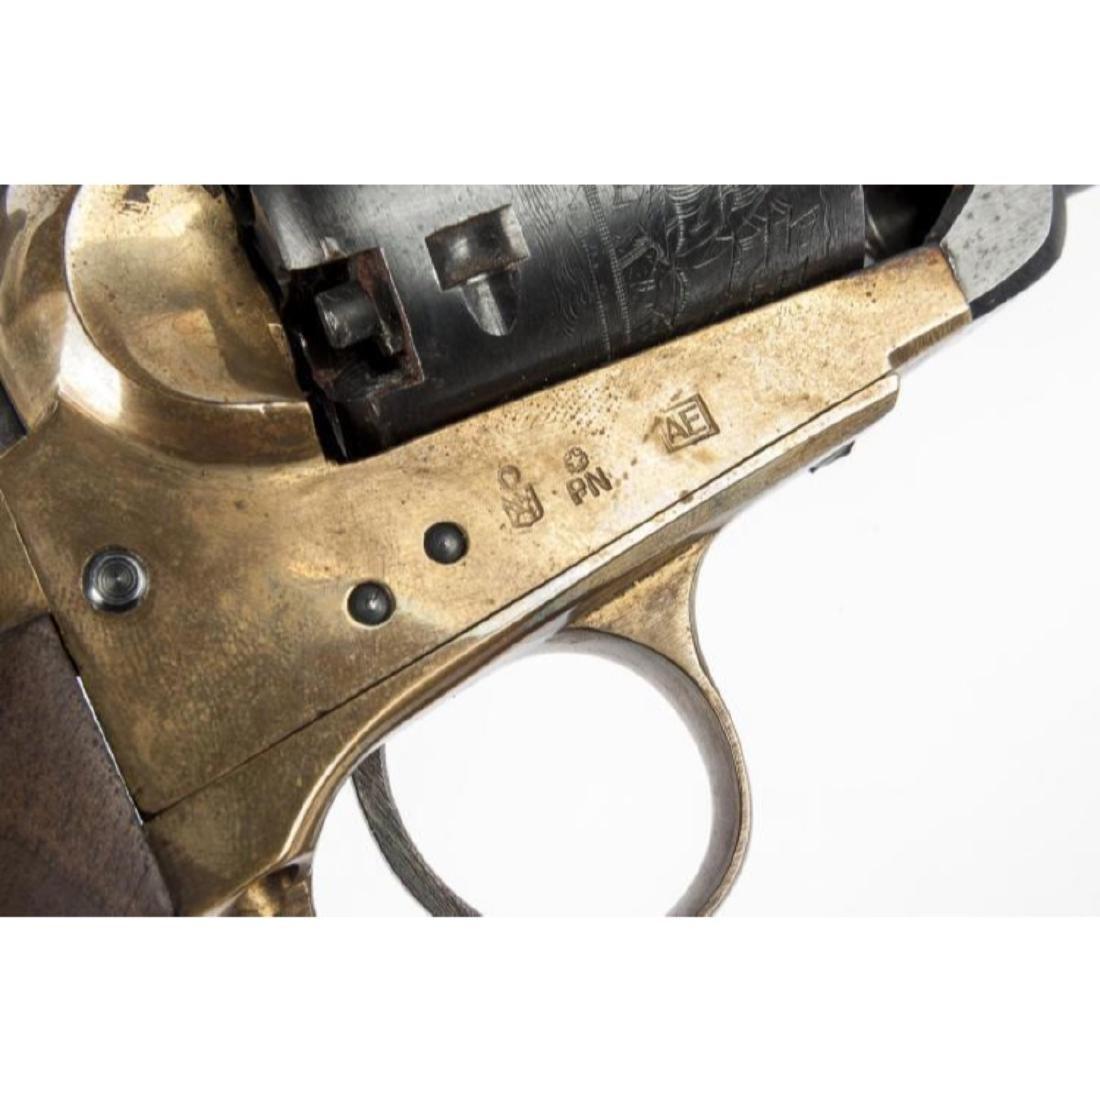 Italian Replica 1851 Navy Revolver - .36 Cal - 6